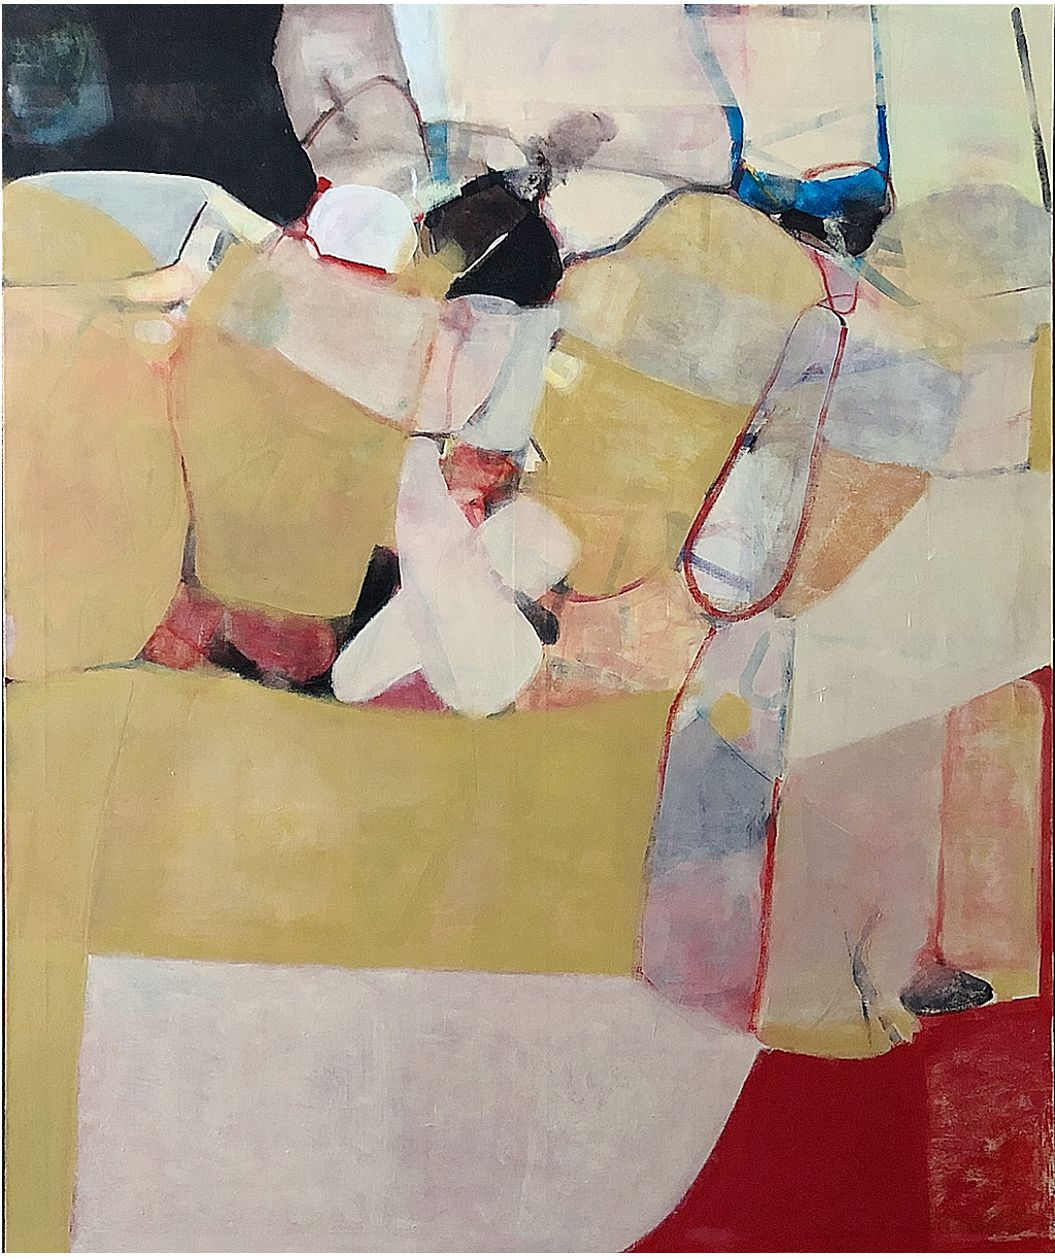 "Robert Szot. Young Life. 2018. Oil on linen. 72"" x 60"""